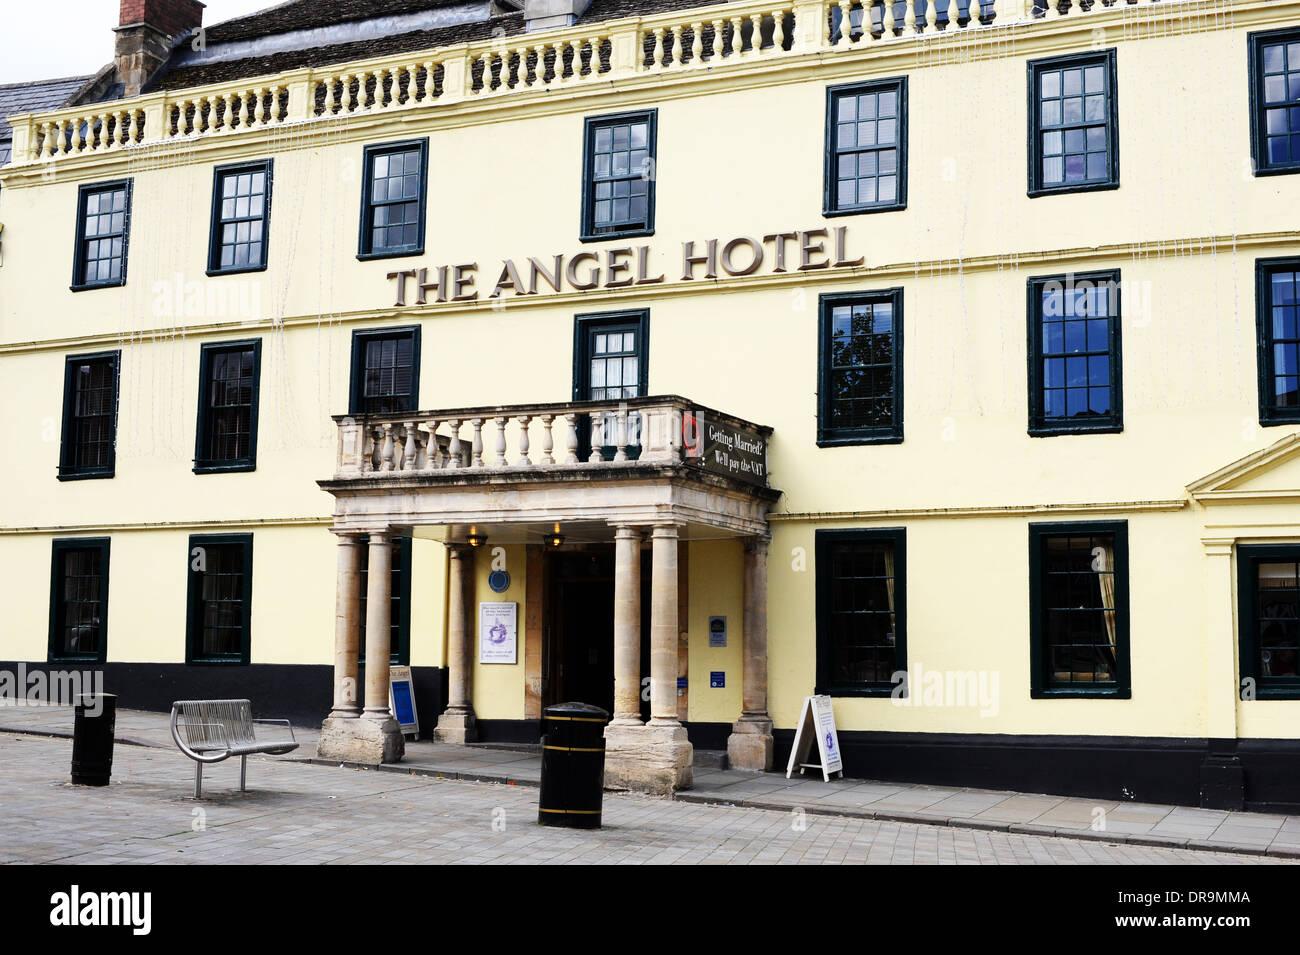 The Angel Hotel in Chippenham, UK. - Stock Image